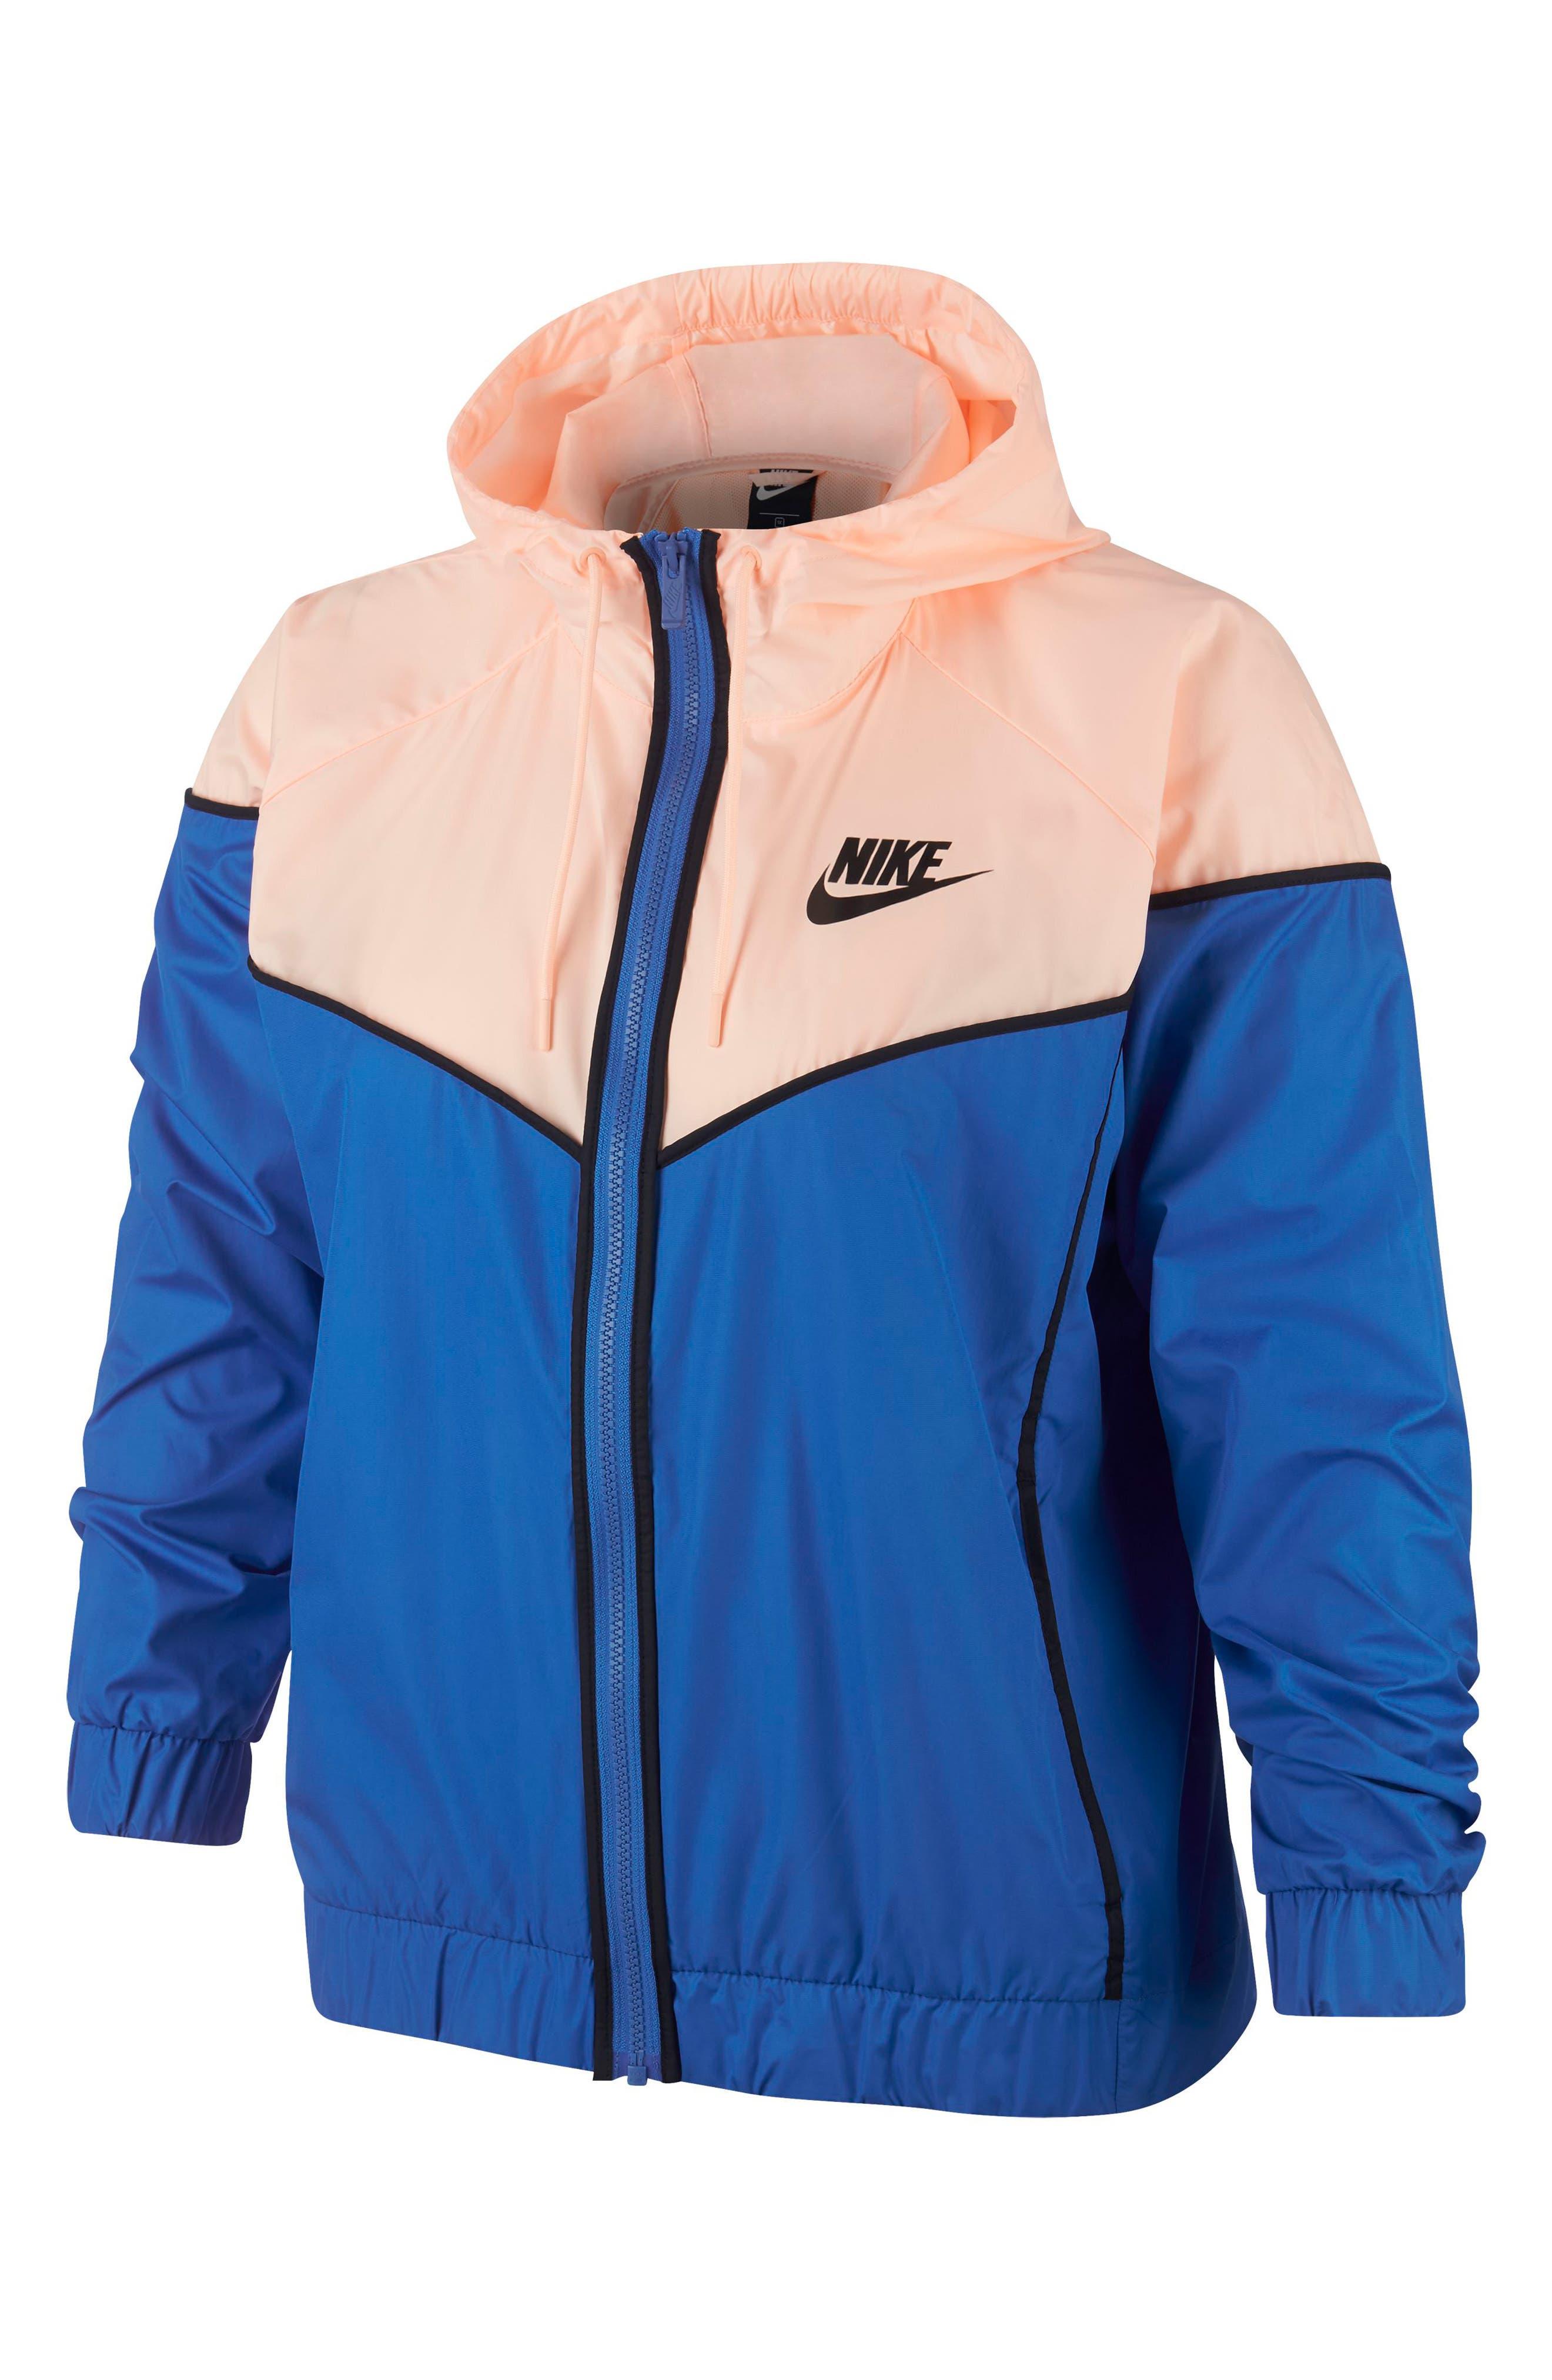 Sportswear Windrunner Jacket,                             Main thumbnail 1, color,                             SIGNAL BLUE/ CRIMSON TINT